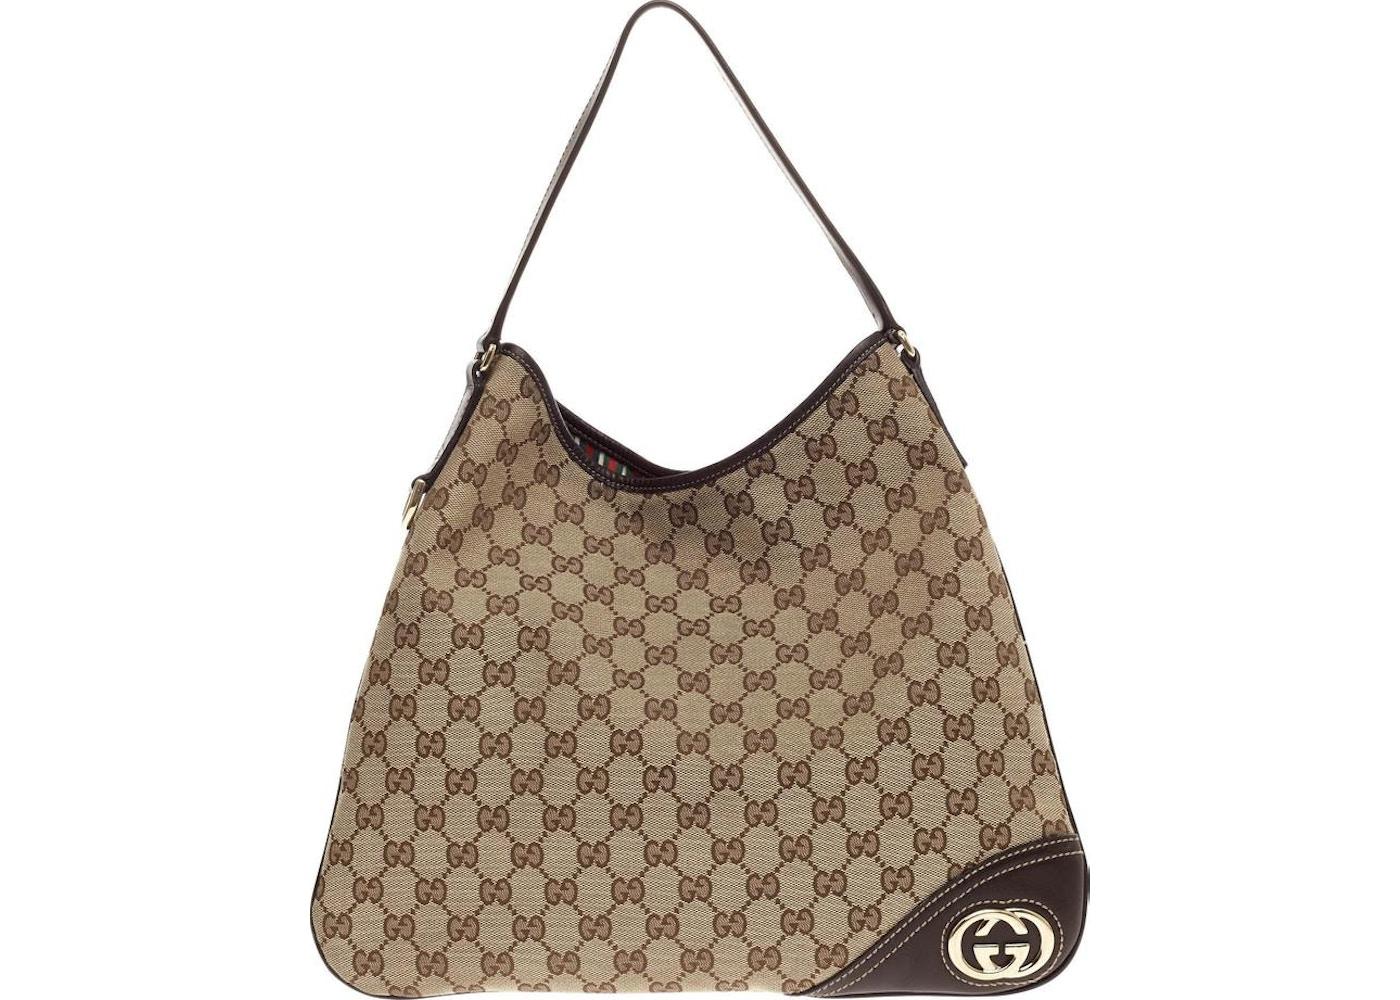 29748fe4fbe Gucci Britt Hobo GG Interlocking GG Medium Brown. GG Interlocking GG Medium  Brown